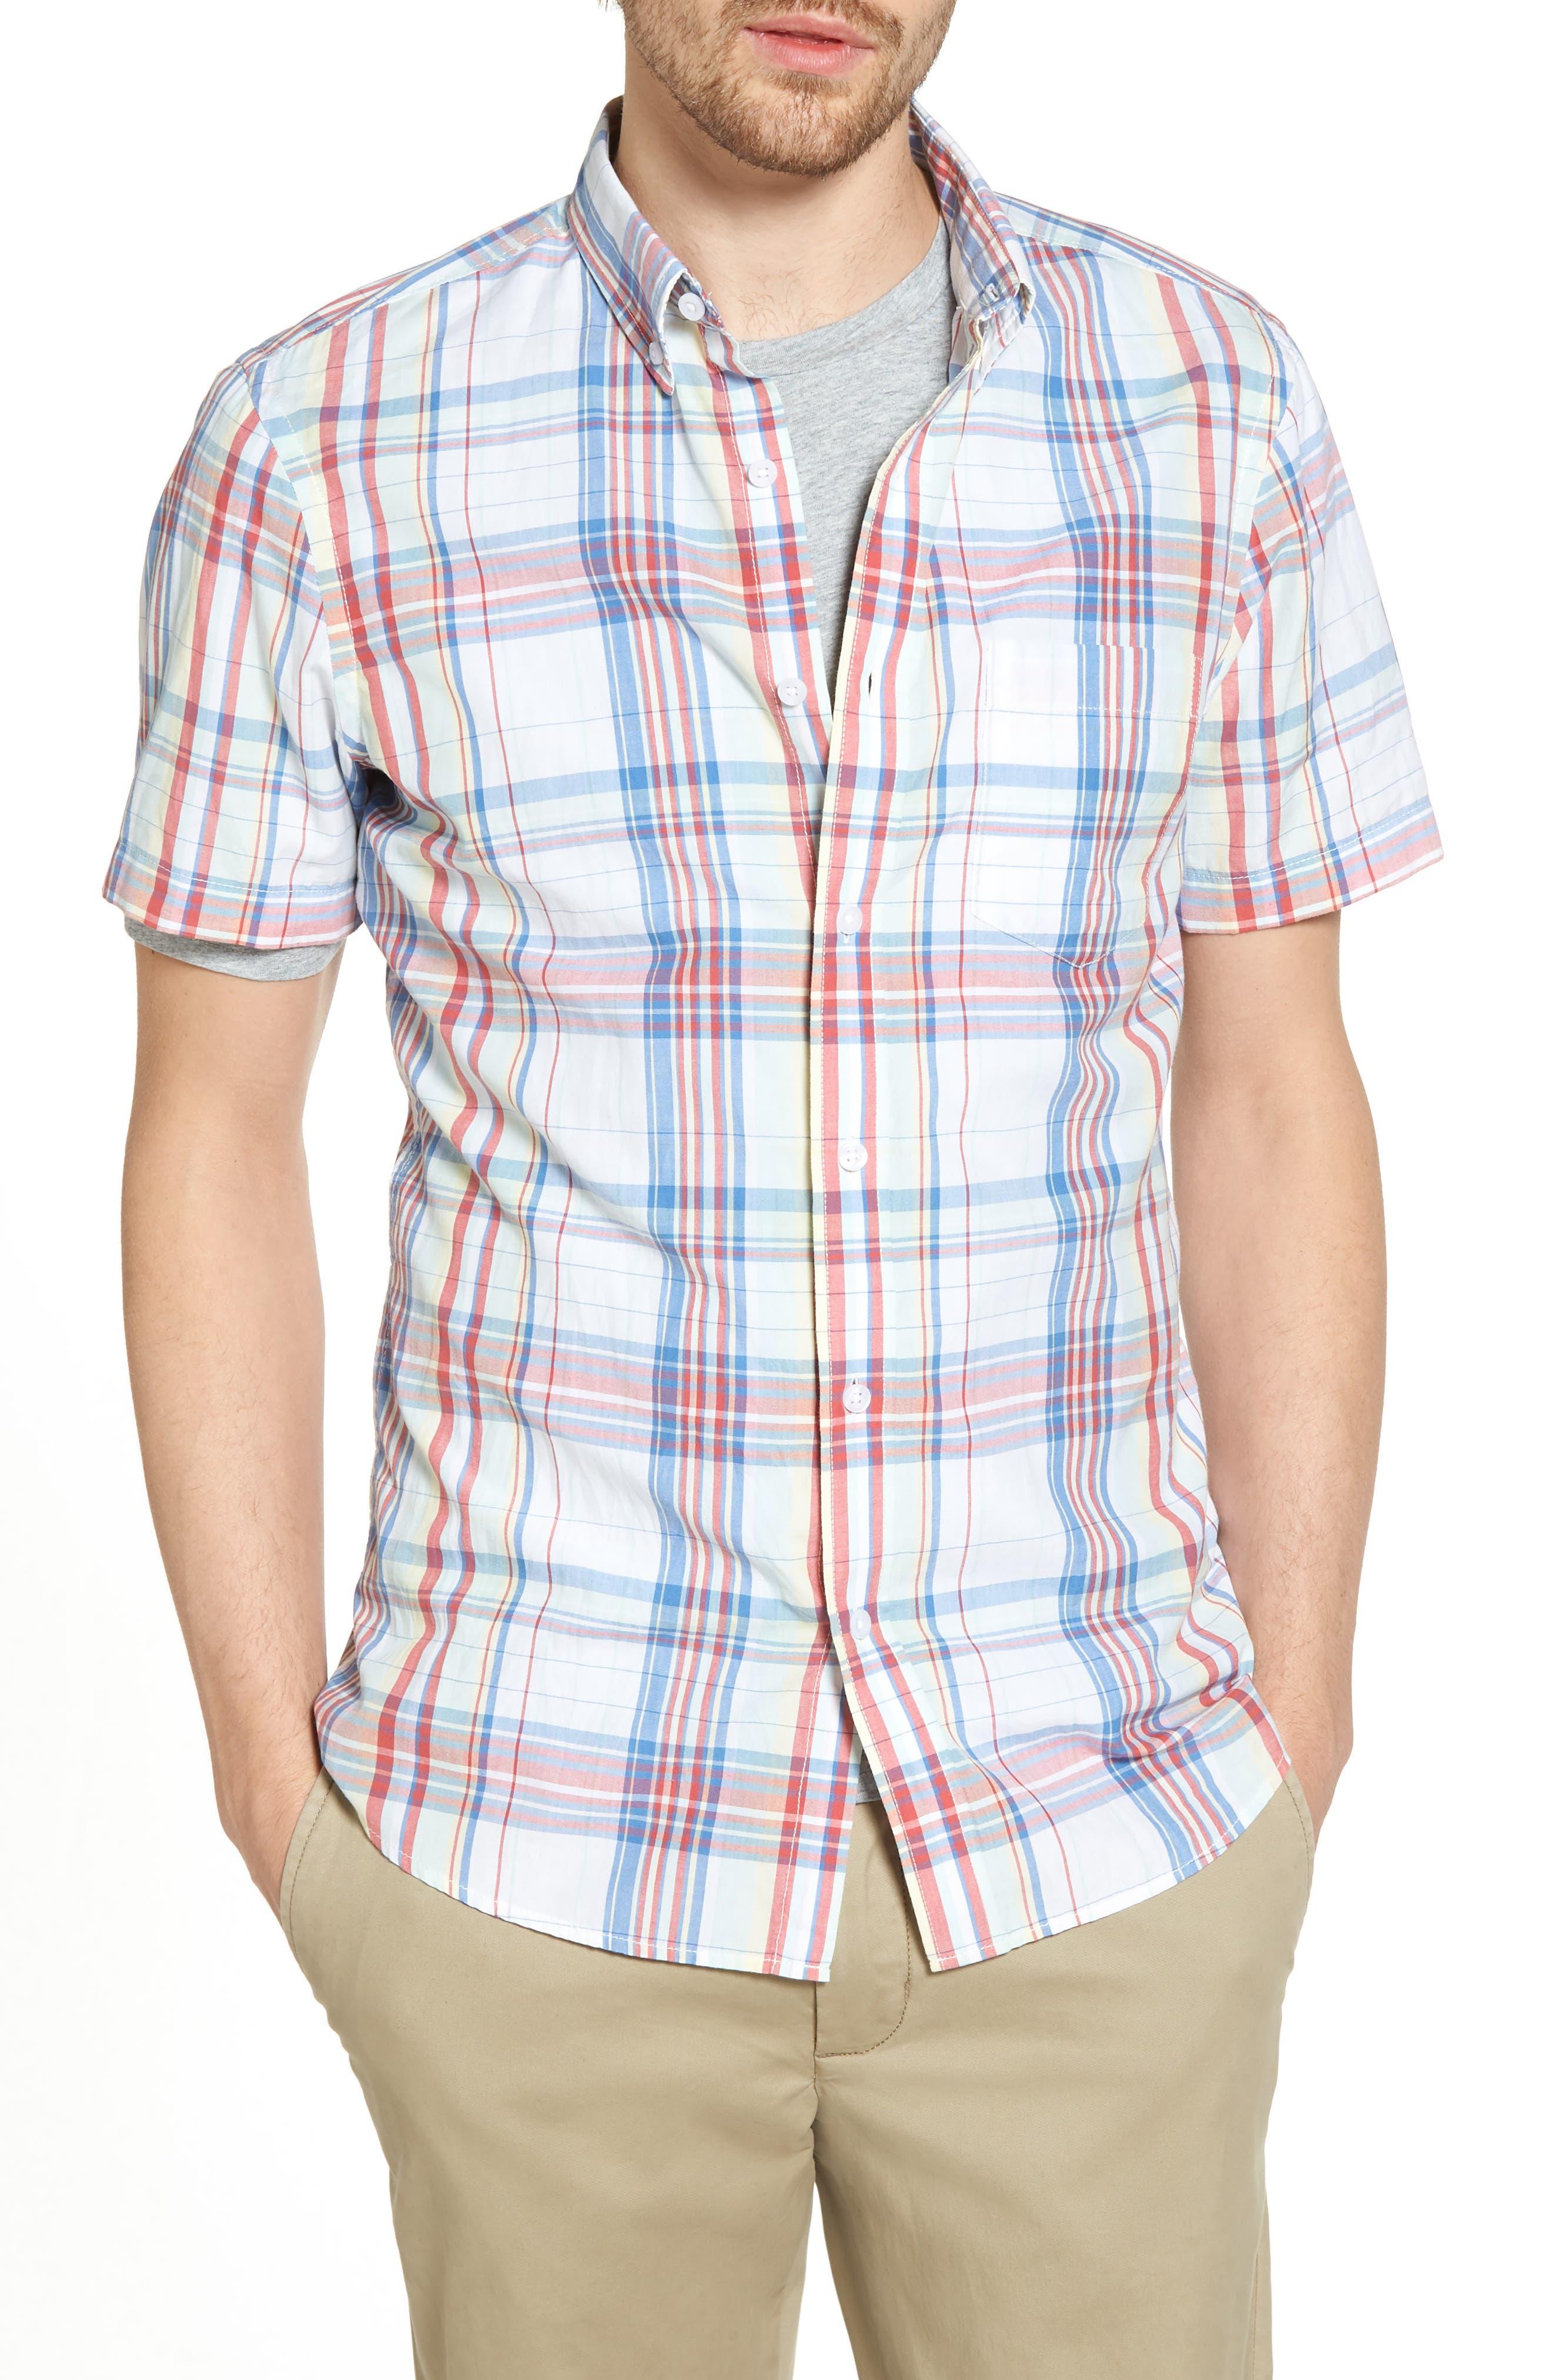 Trim Fit Plaid Short Sleeve Sport Shirt,                         Main,                         color, White Red Multi Plaid